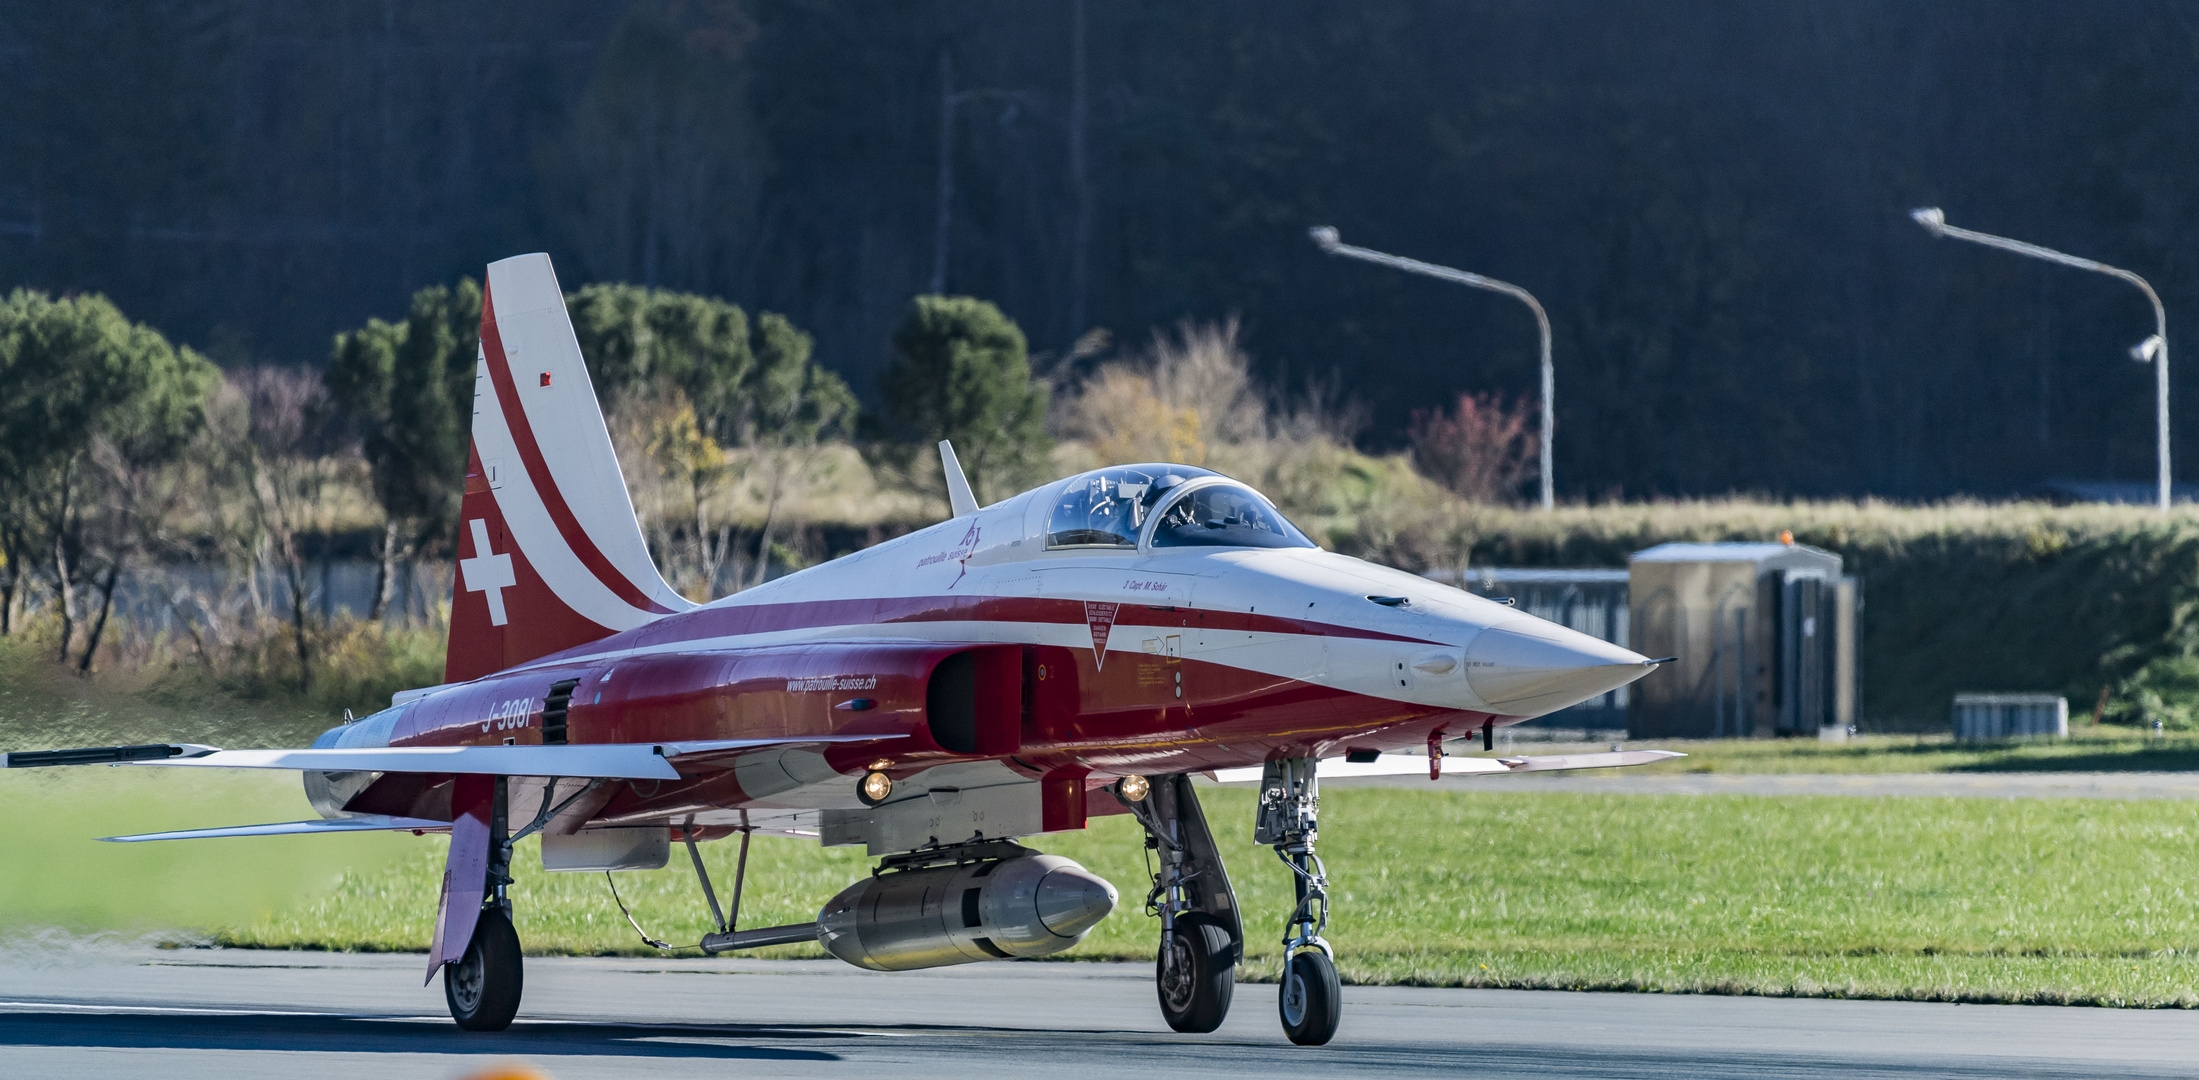 Meiringen, Air Base, Patrouille Suisse, F-5E Tiger II